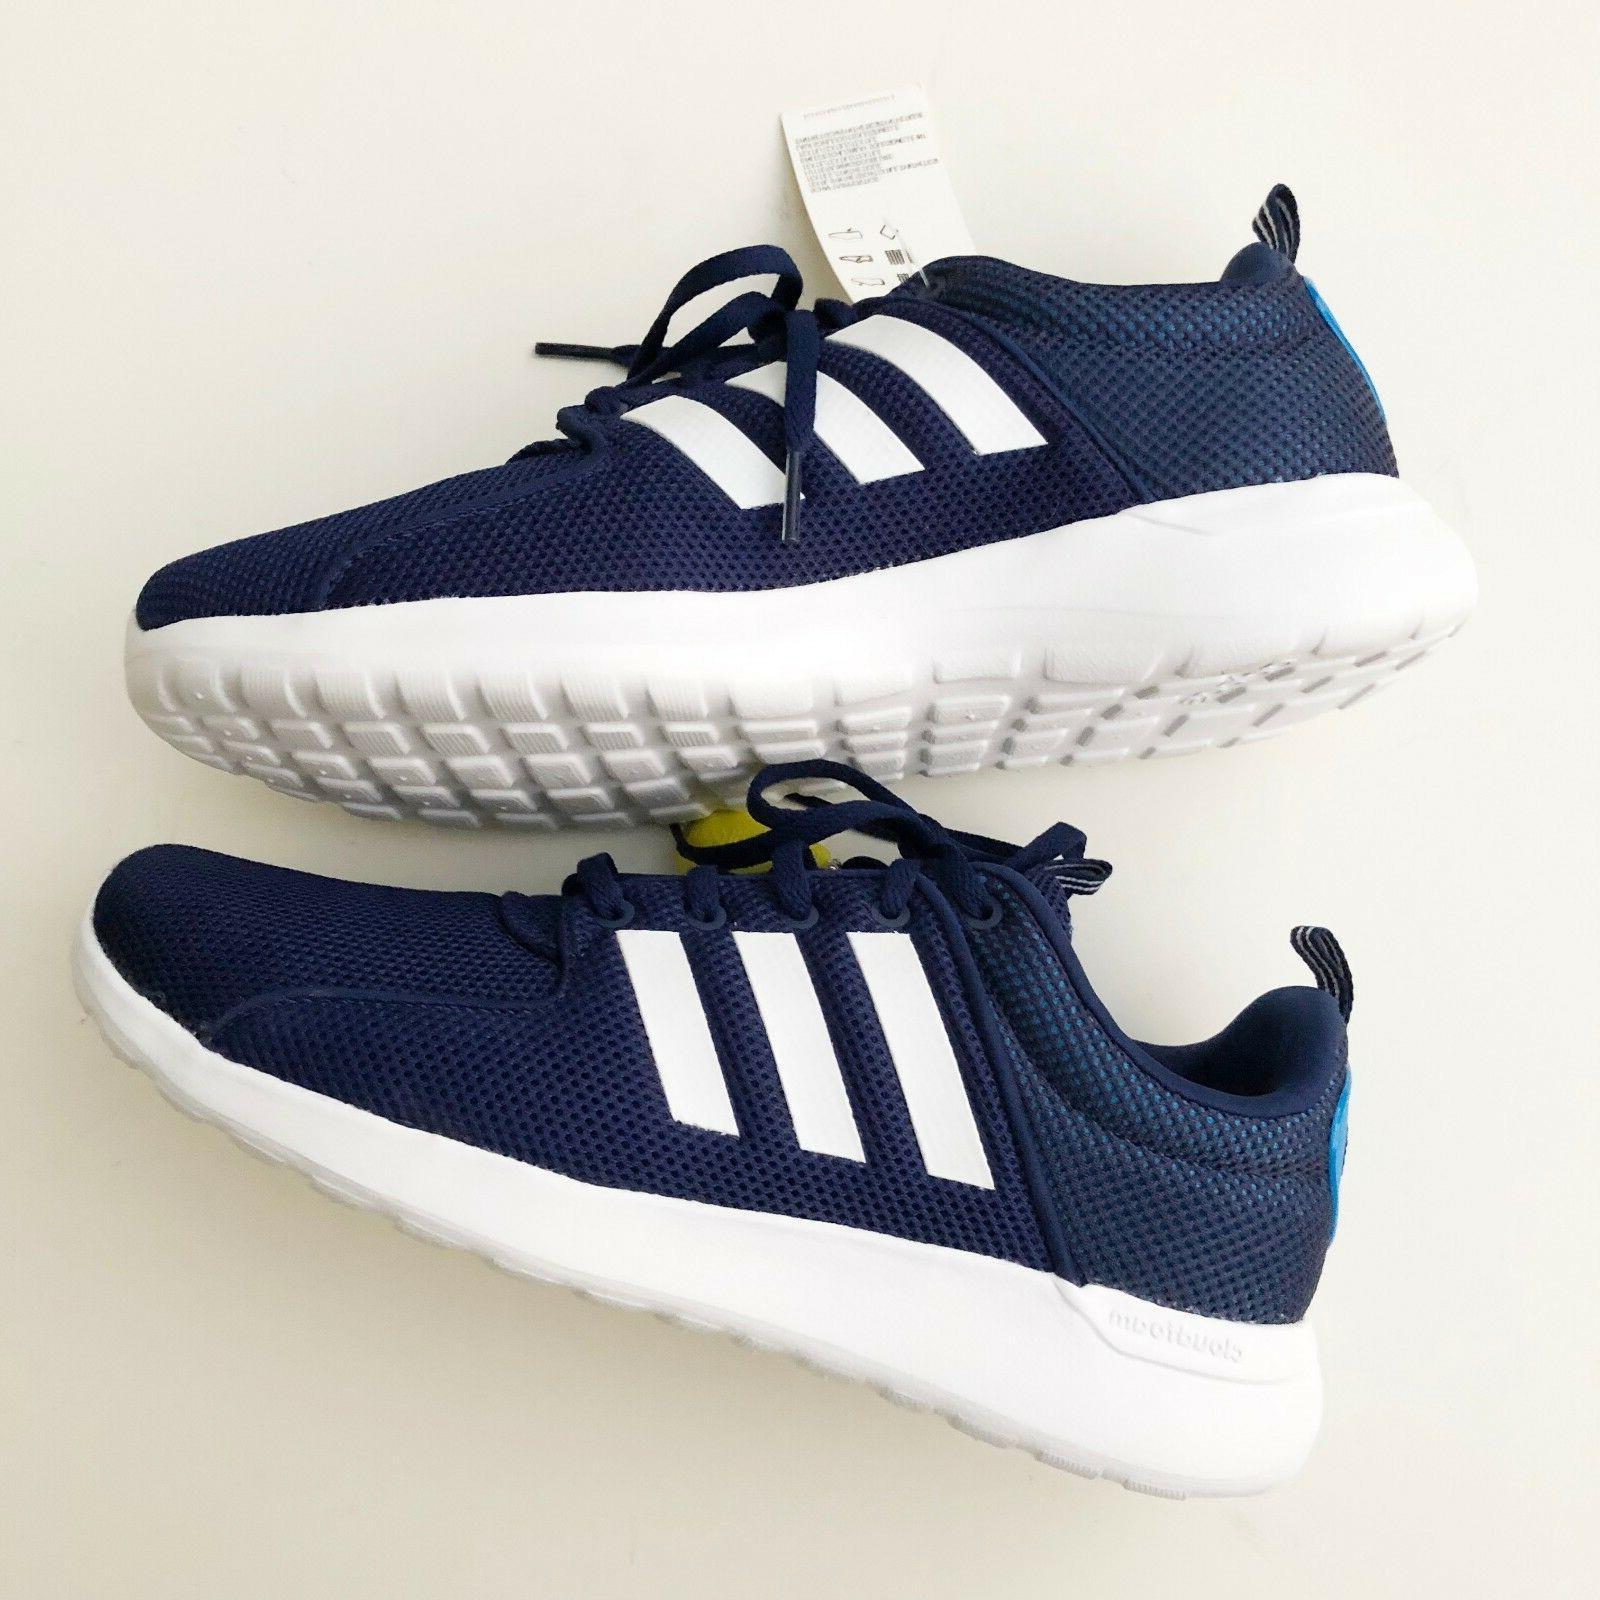 Adidas CF Lite Racer Mens Training Running Shoes Blue White